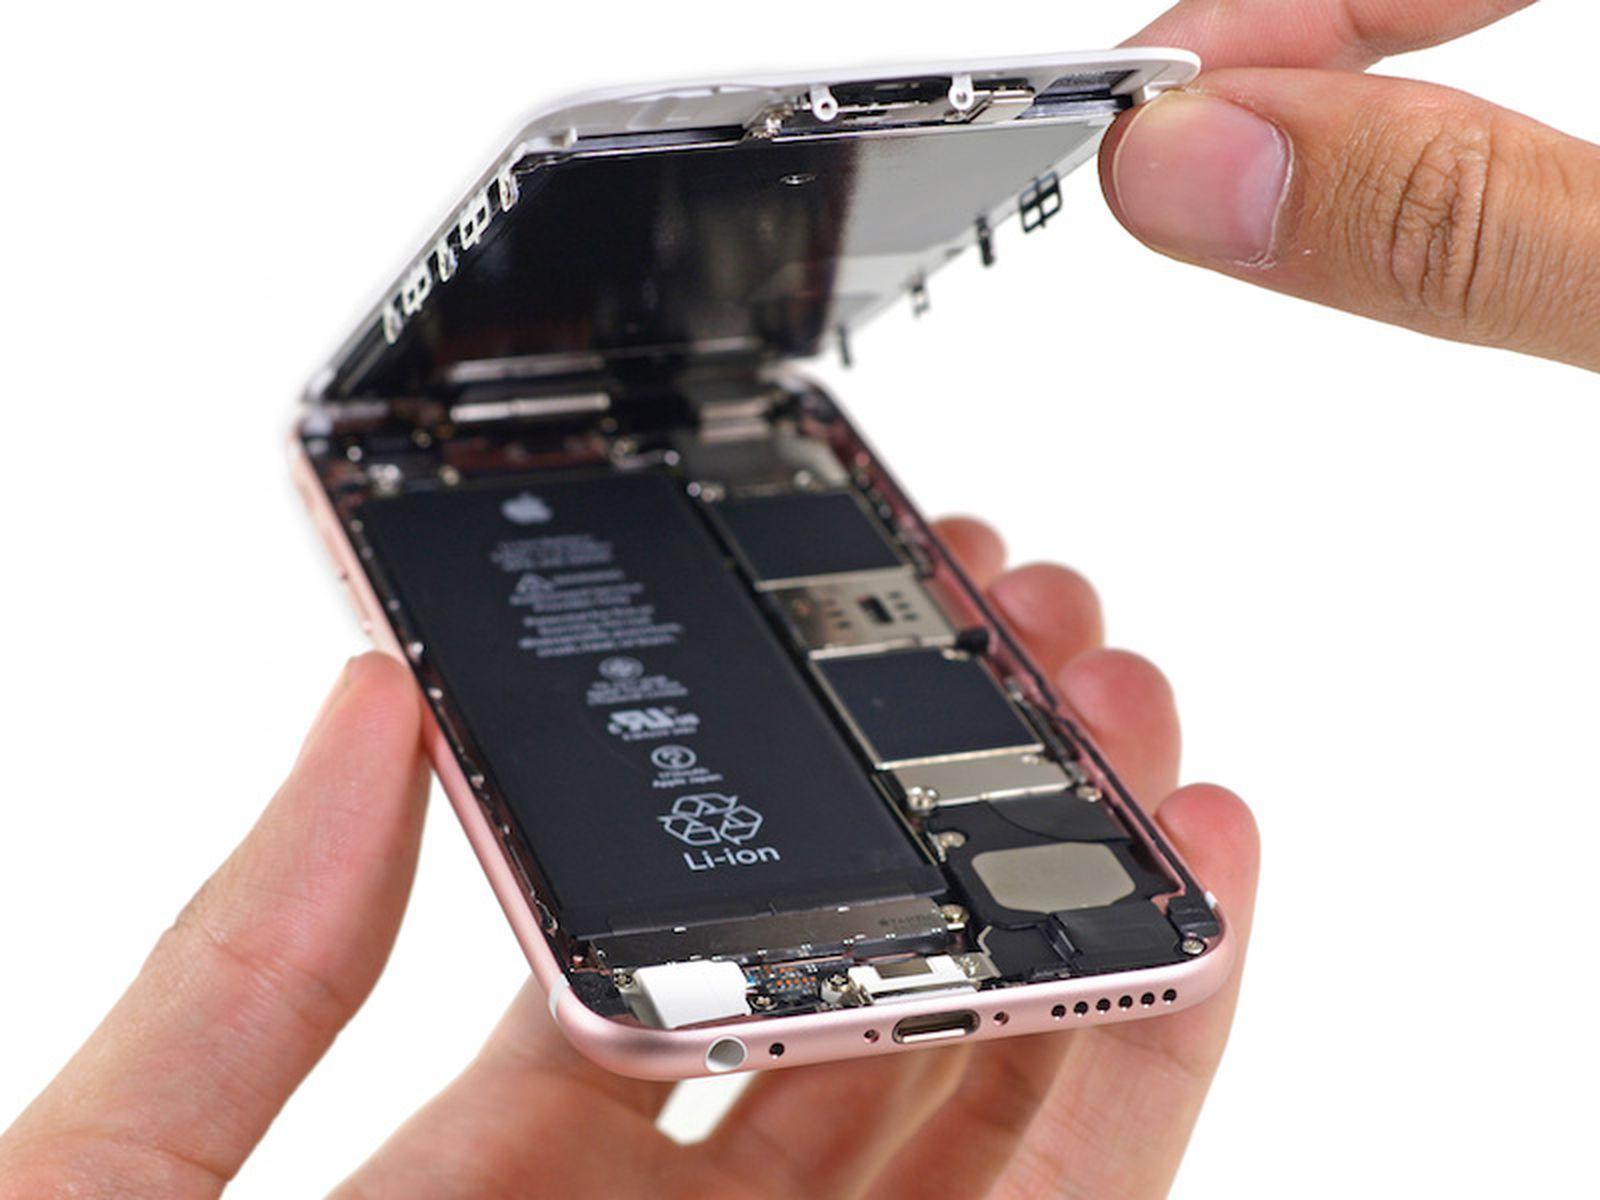 Iphone 6s Teardown 1715 Mah Battery Taptic Engine X Ray 3d Touch Display Macrumors